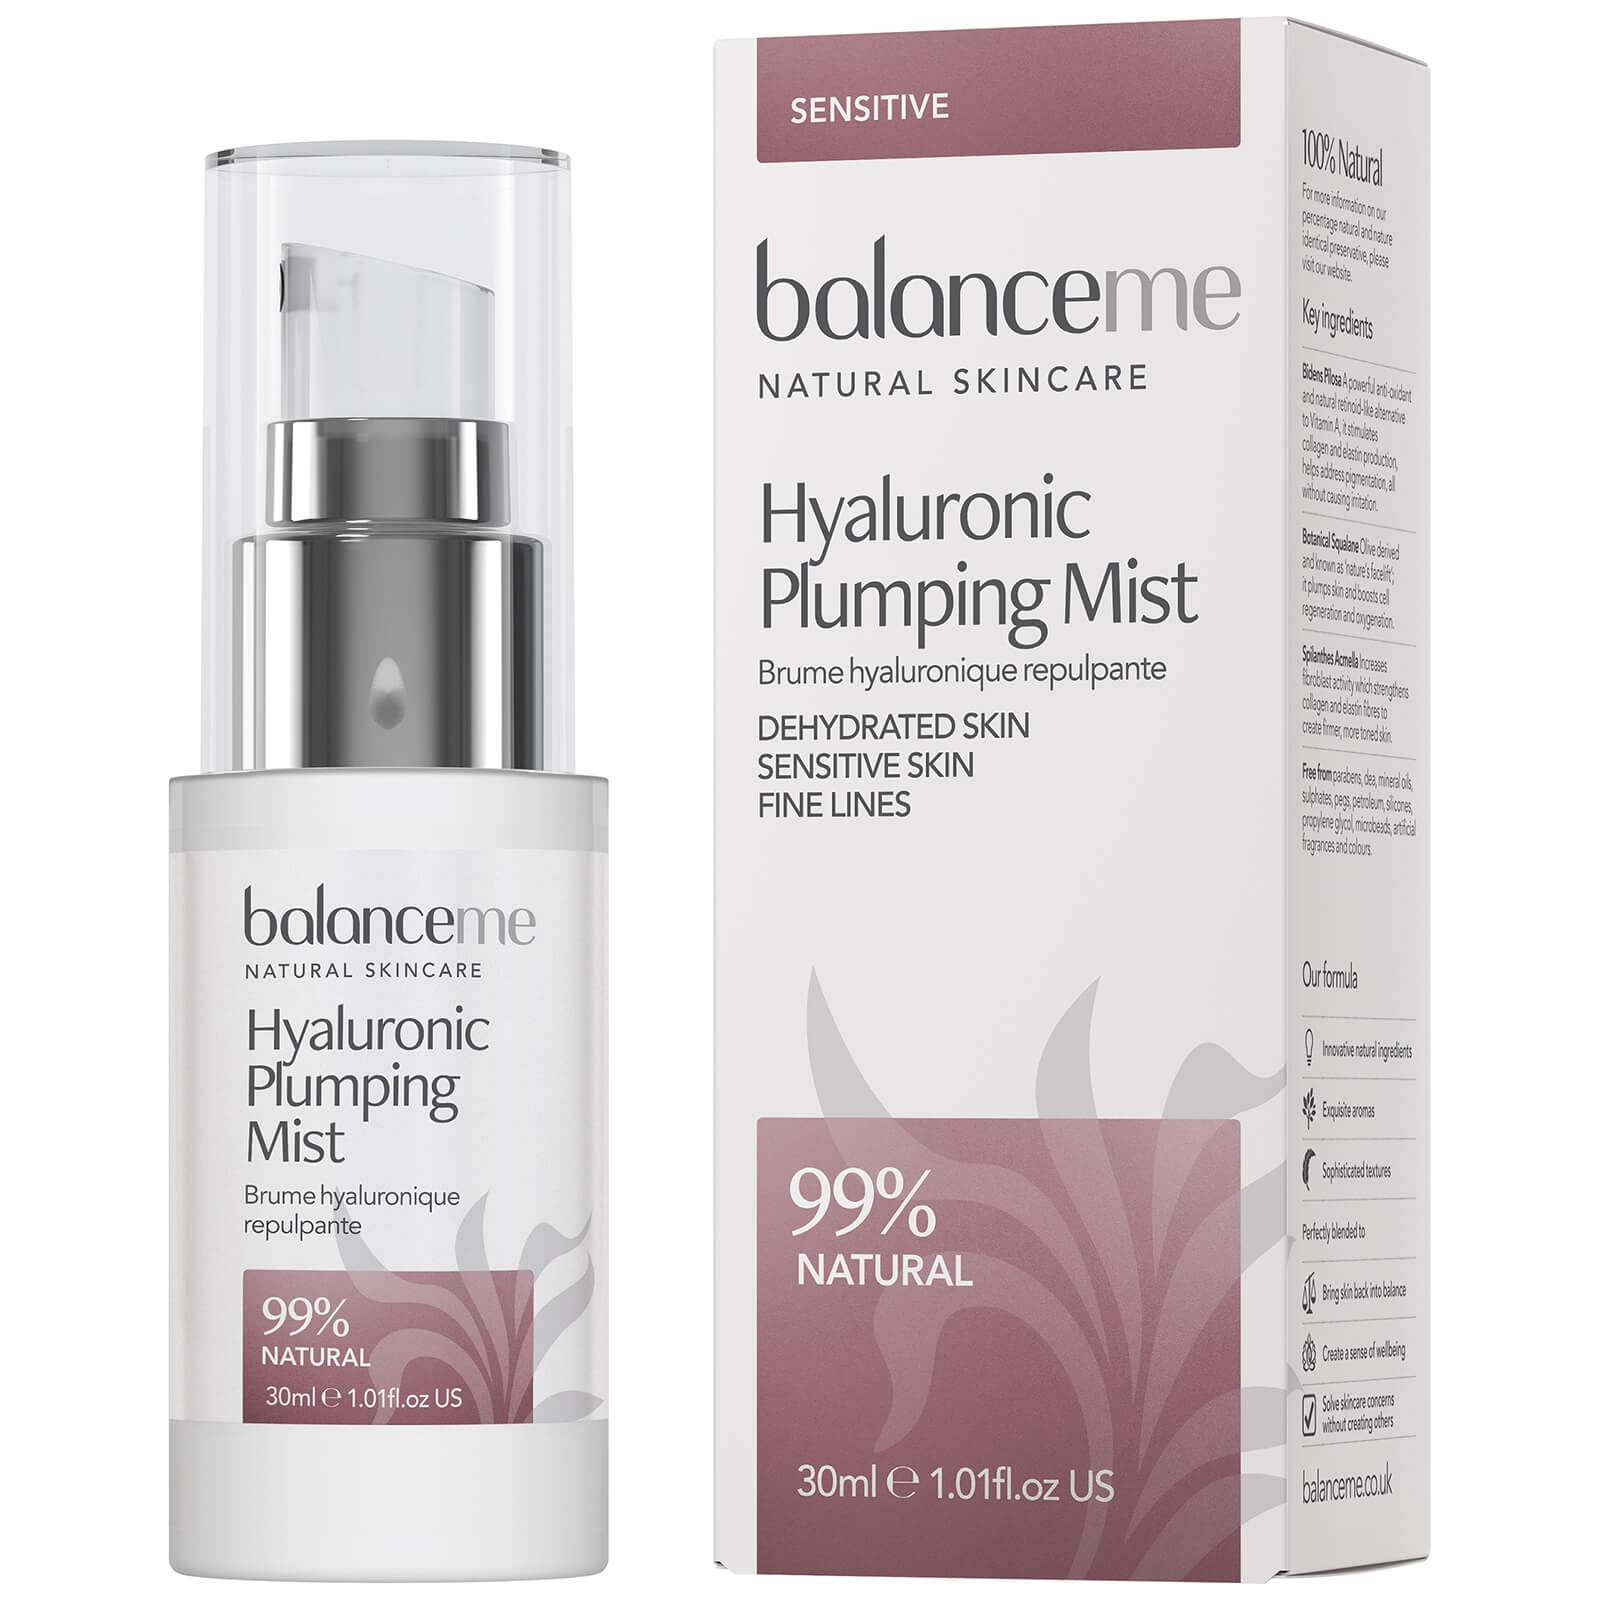 Balance Me Hyaluronic Plumping Mist 30ml